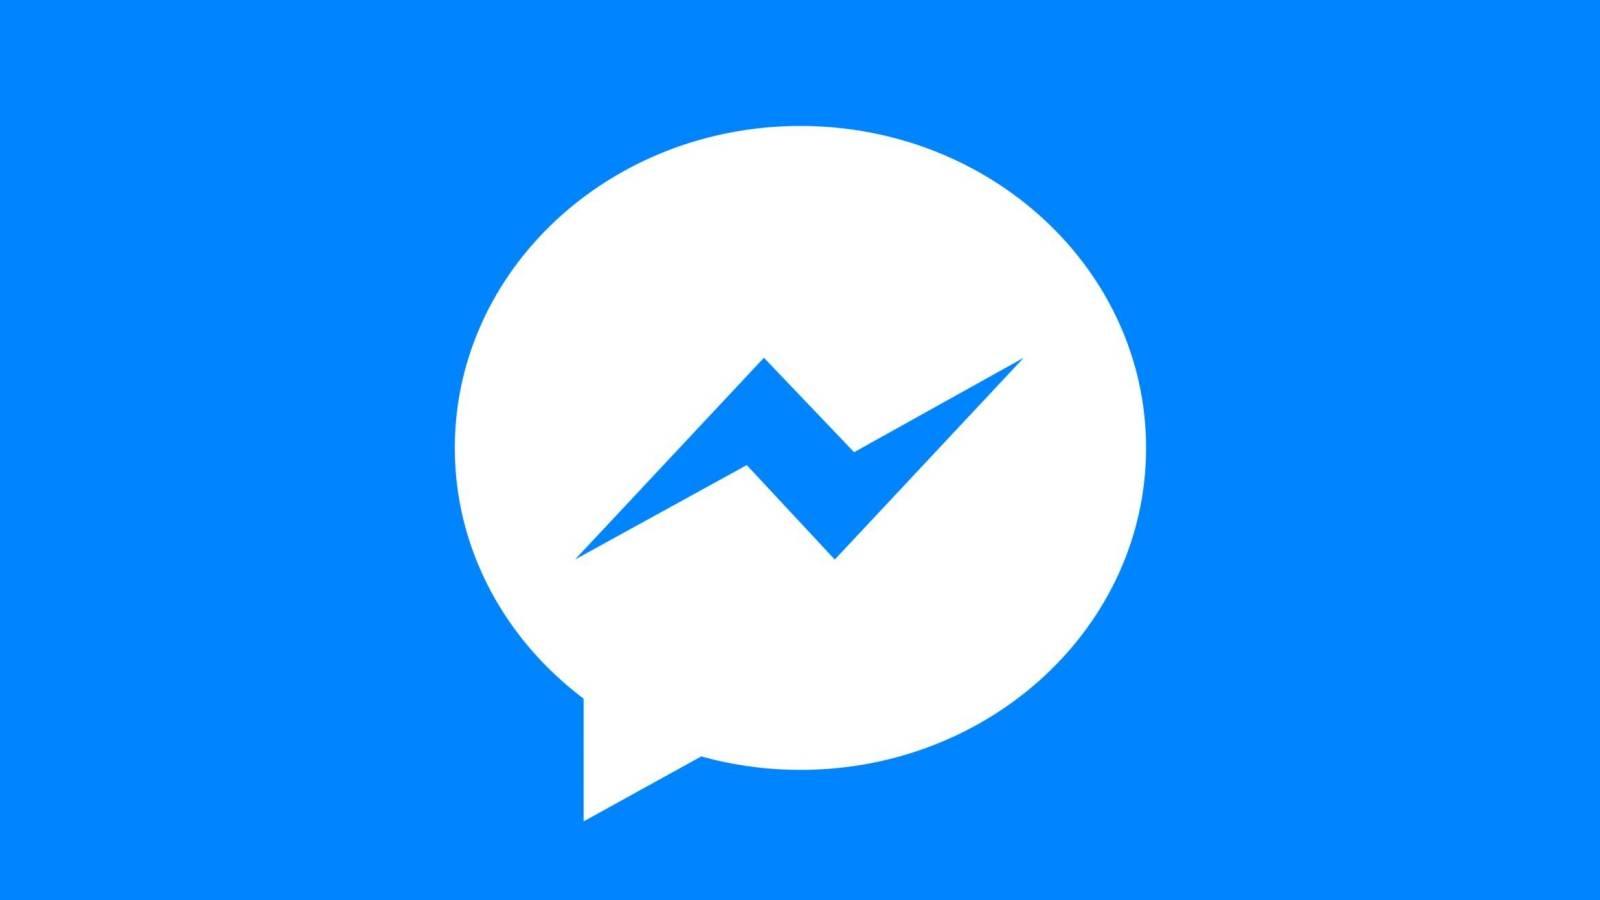 Facebook Messenger Update a fost lansat Astazi pentru Telefoane